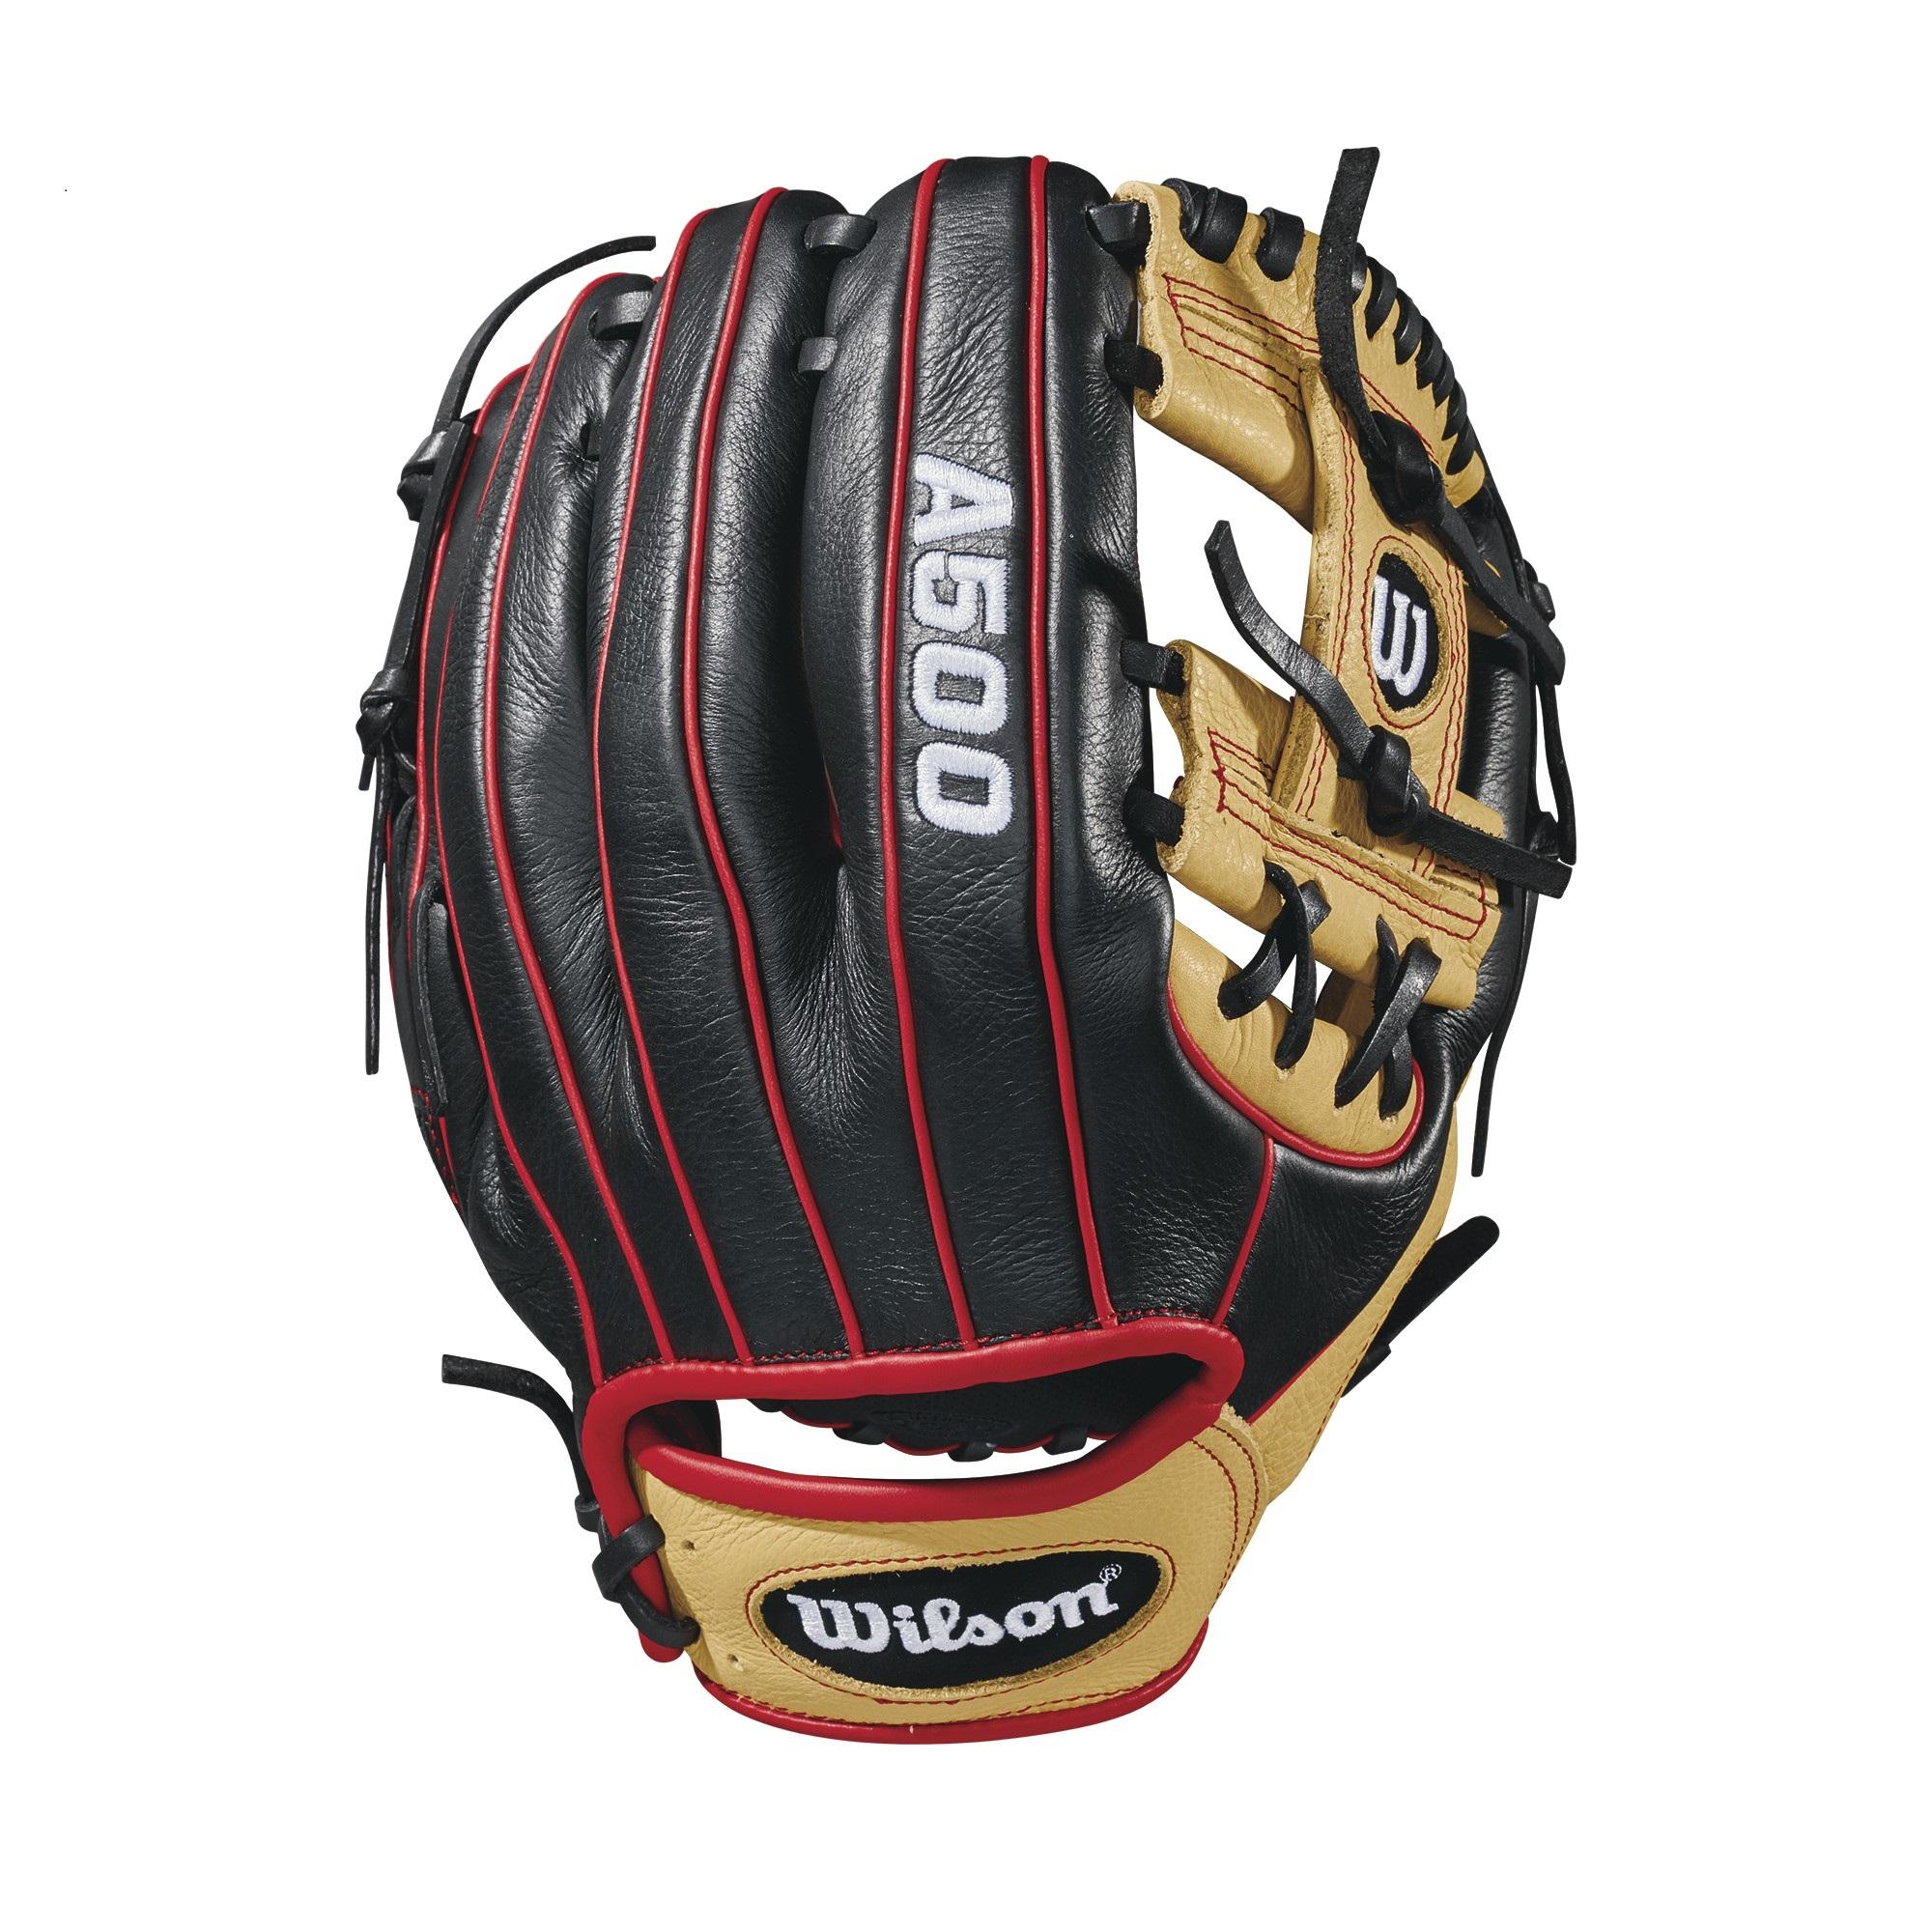 "Wilson A500 11"" Glove - Left Hand Throw"